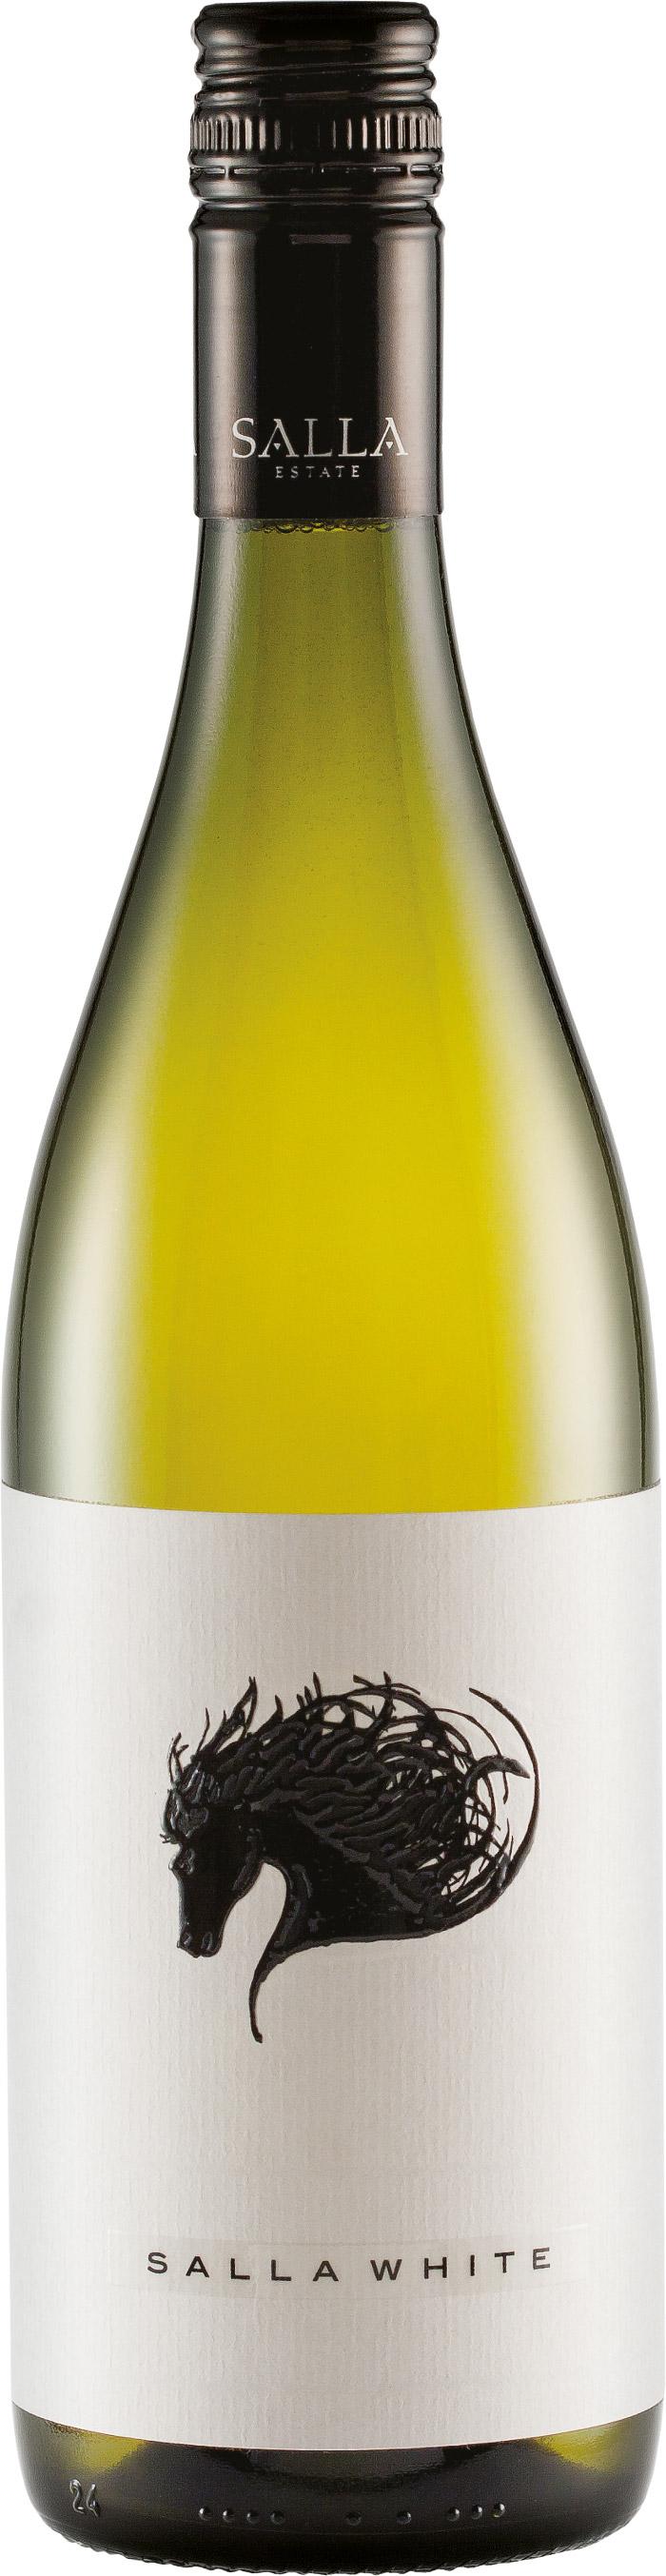 Salla White Wine Label — The Dieline | Packaging ...